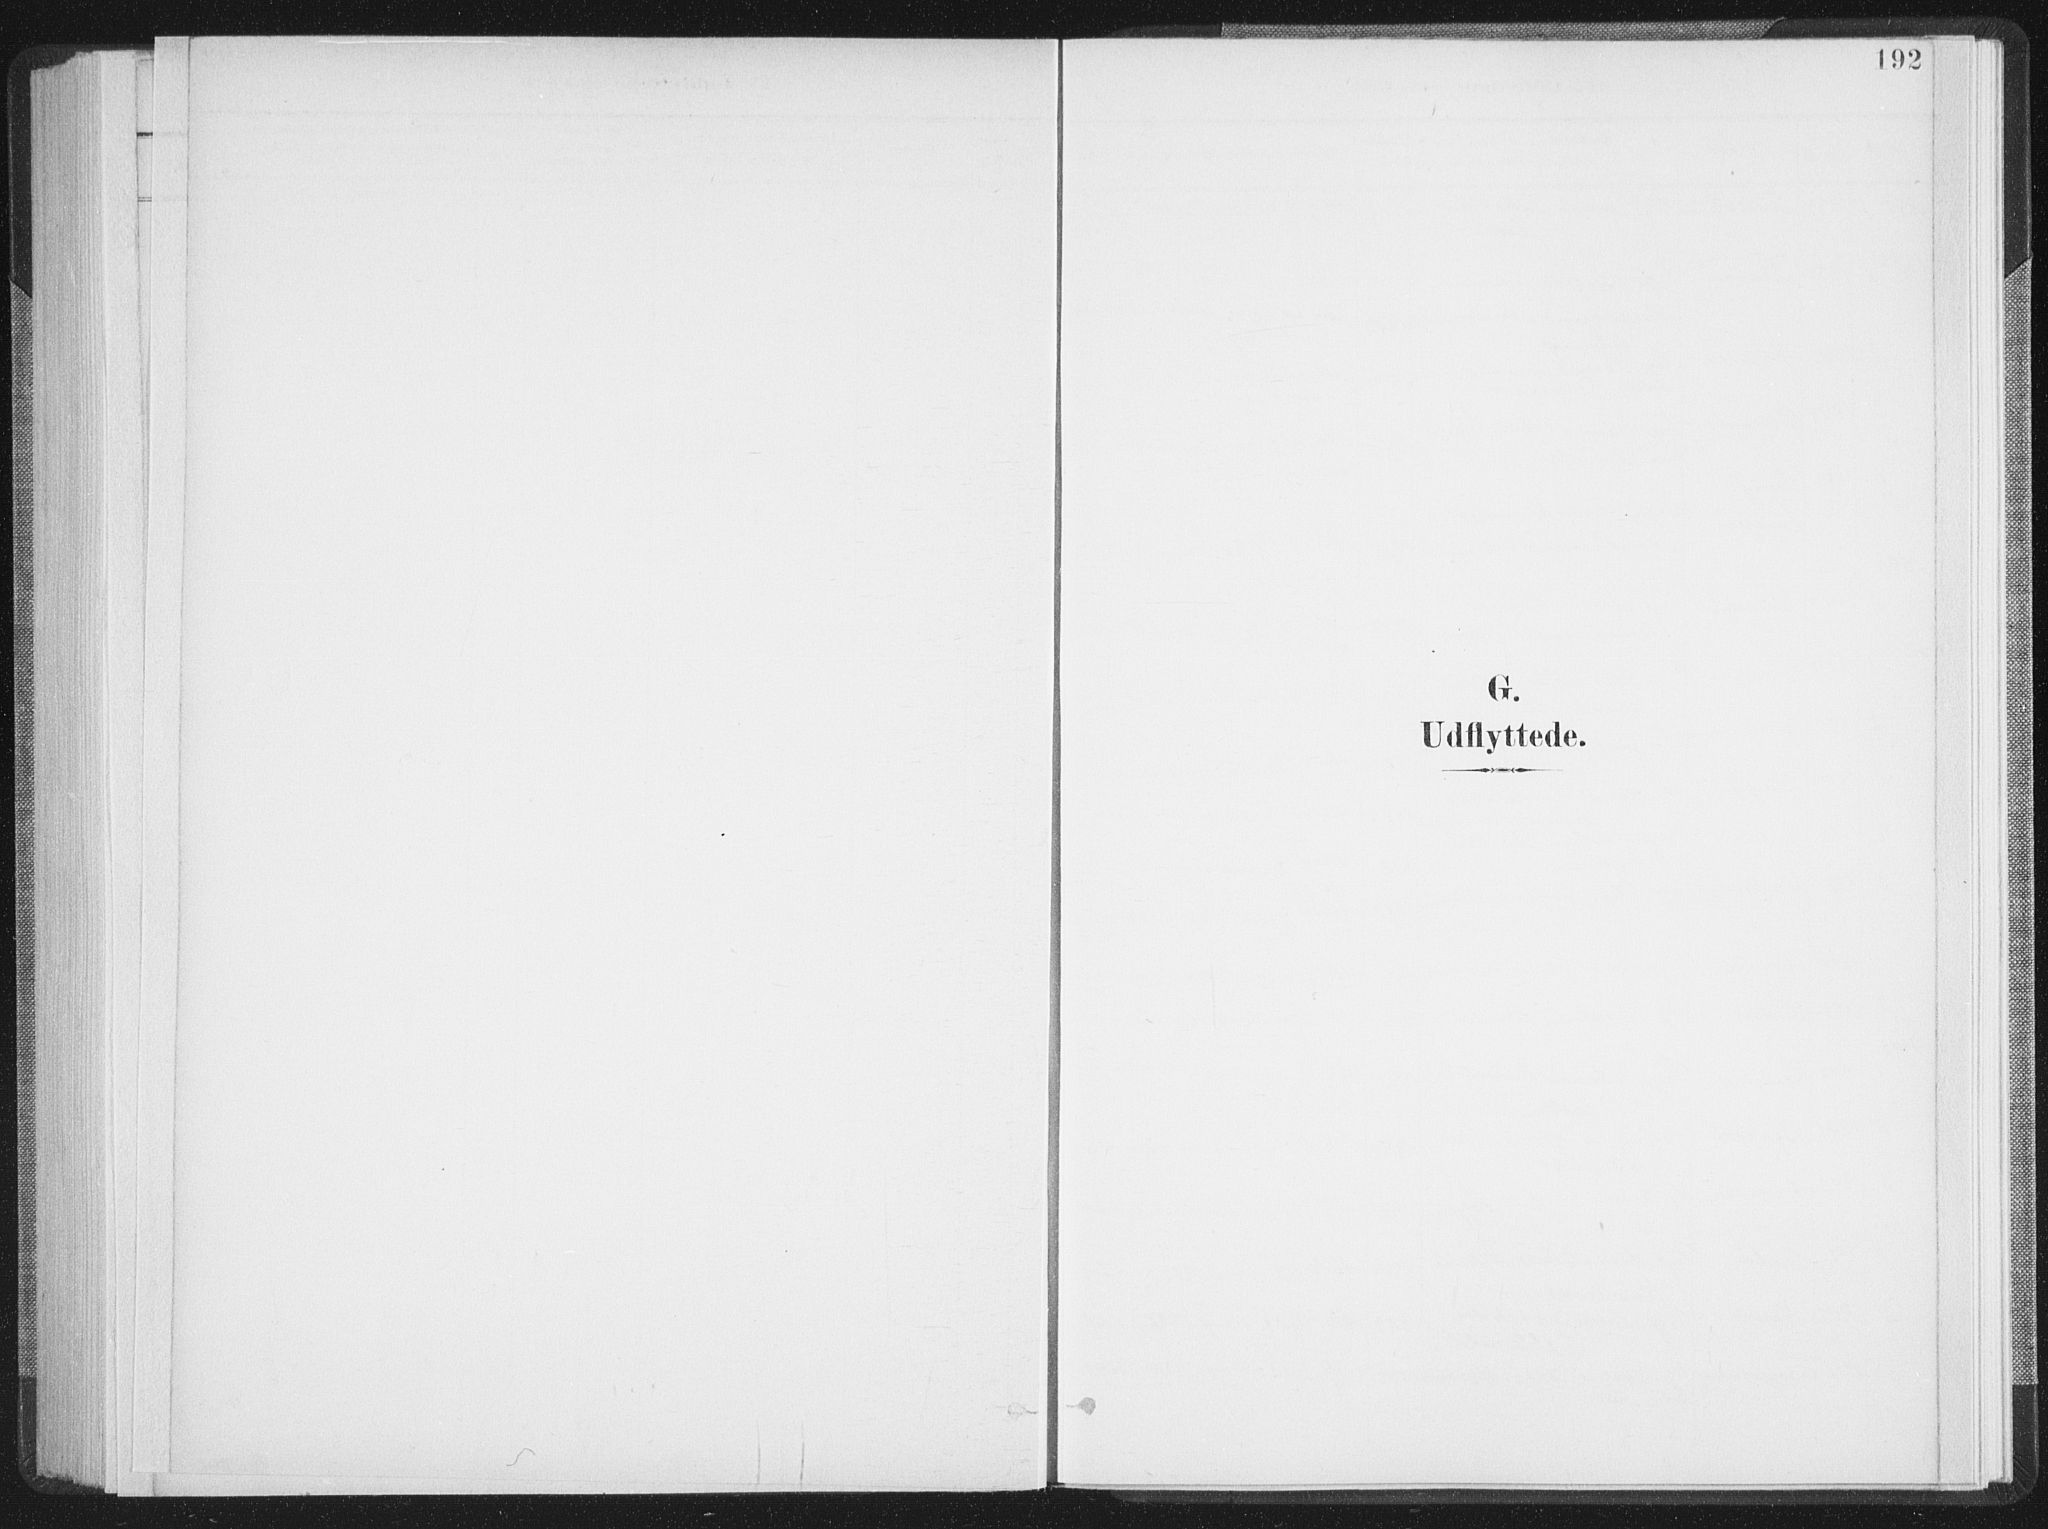 SAT, Ministerialprotokoller, klokkerbøker og fødselsregistre - Nordland, 897/L1400: Ministerialbok nr. 897A07, 1897-1908, s. 192